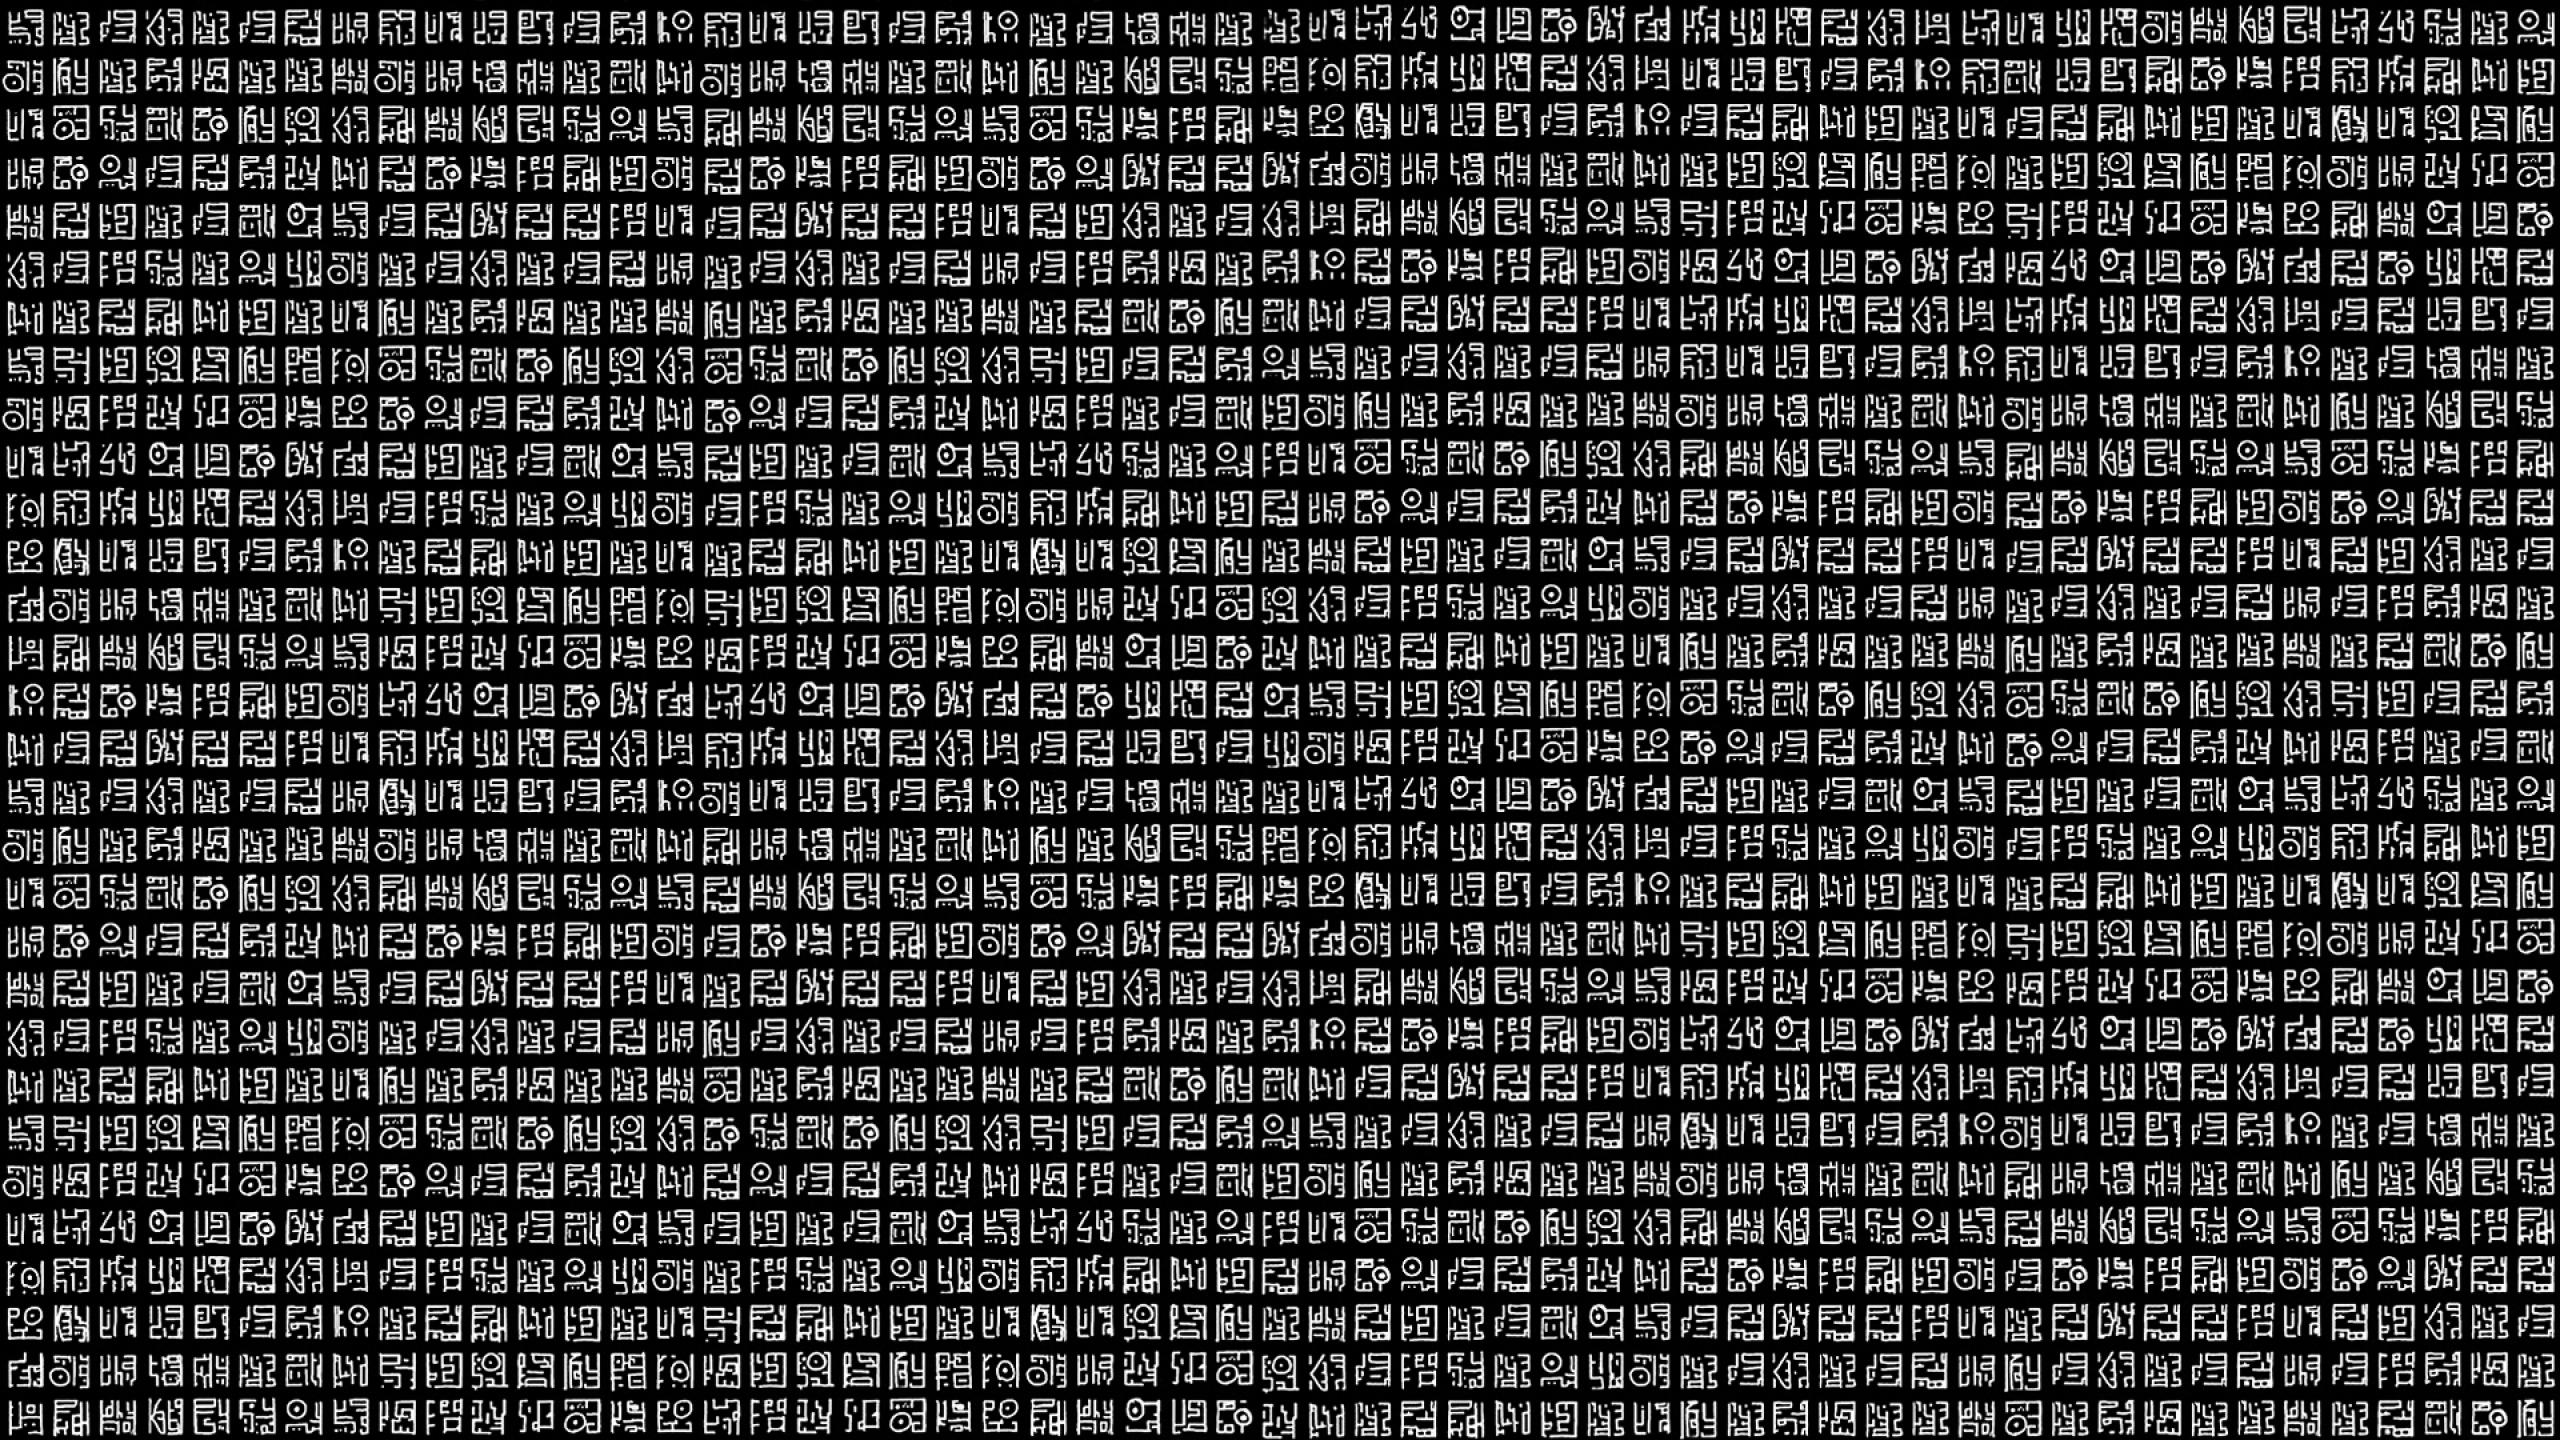 Hieroglyphics Wallpaper 26   2560 X 1440 stmednet 2560x1440